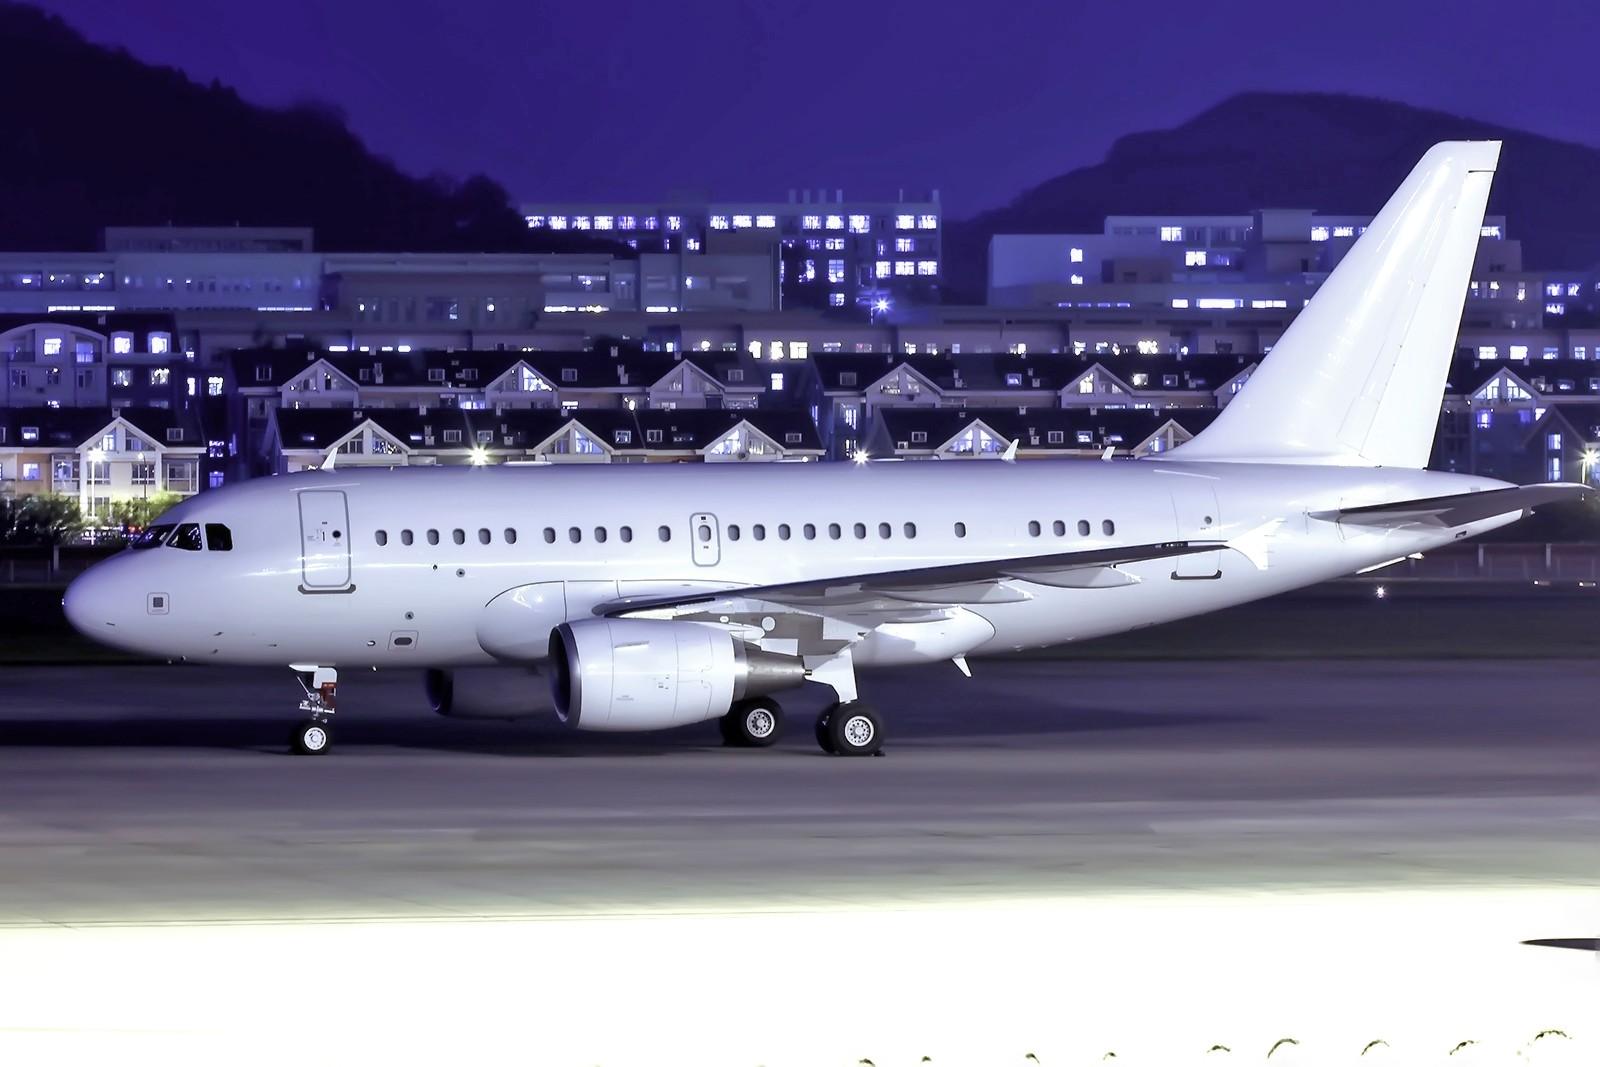 Re:[原创][DLC]夜景专帖…...连载中…... AIRBUS A318 VP-CBY 中国大连周水子国际机场